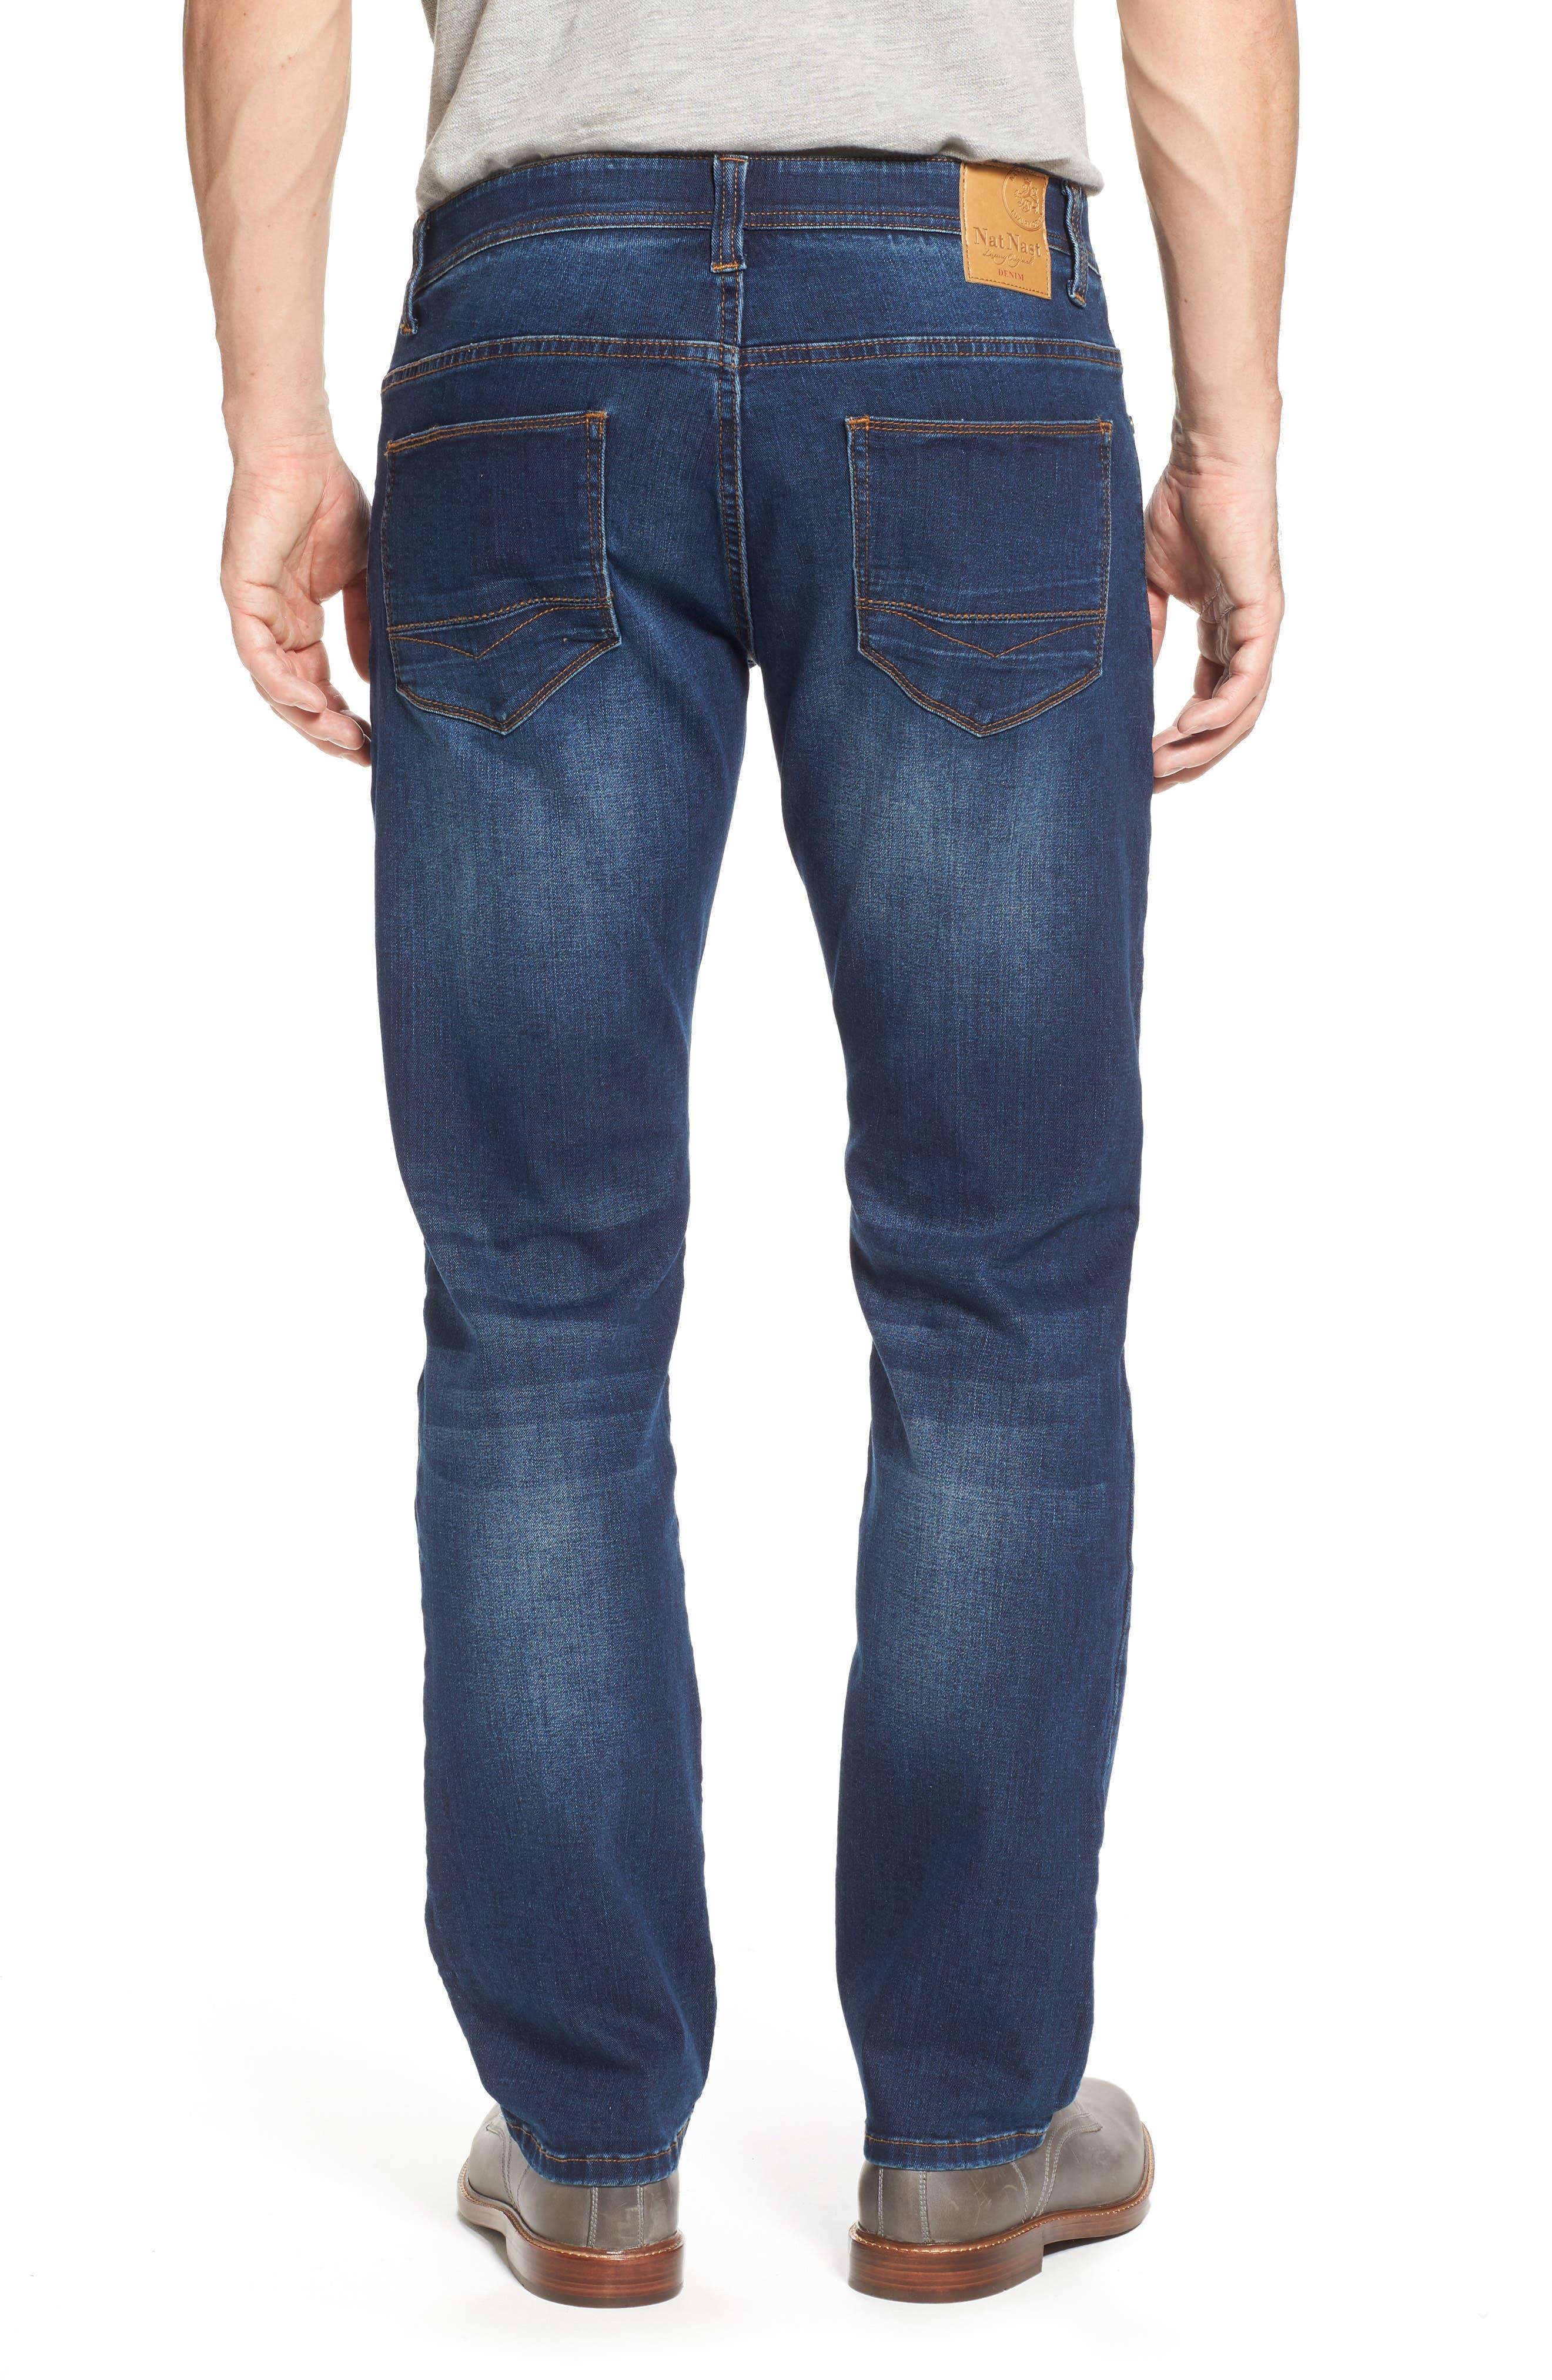 Maverick Stretch Slim Fit Jeans,                             Alternate thumbnail 2, color,                             400